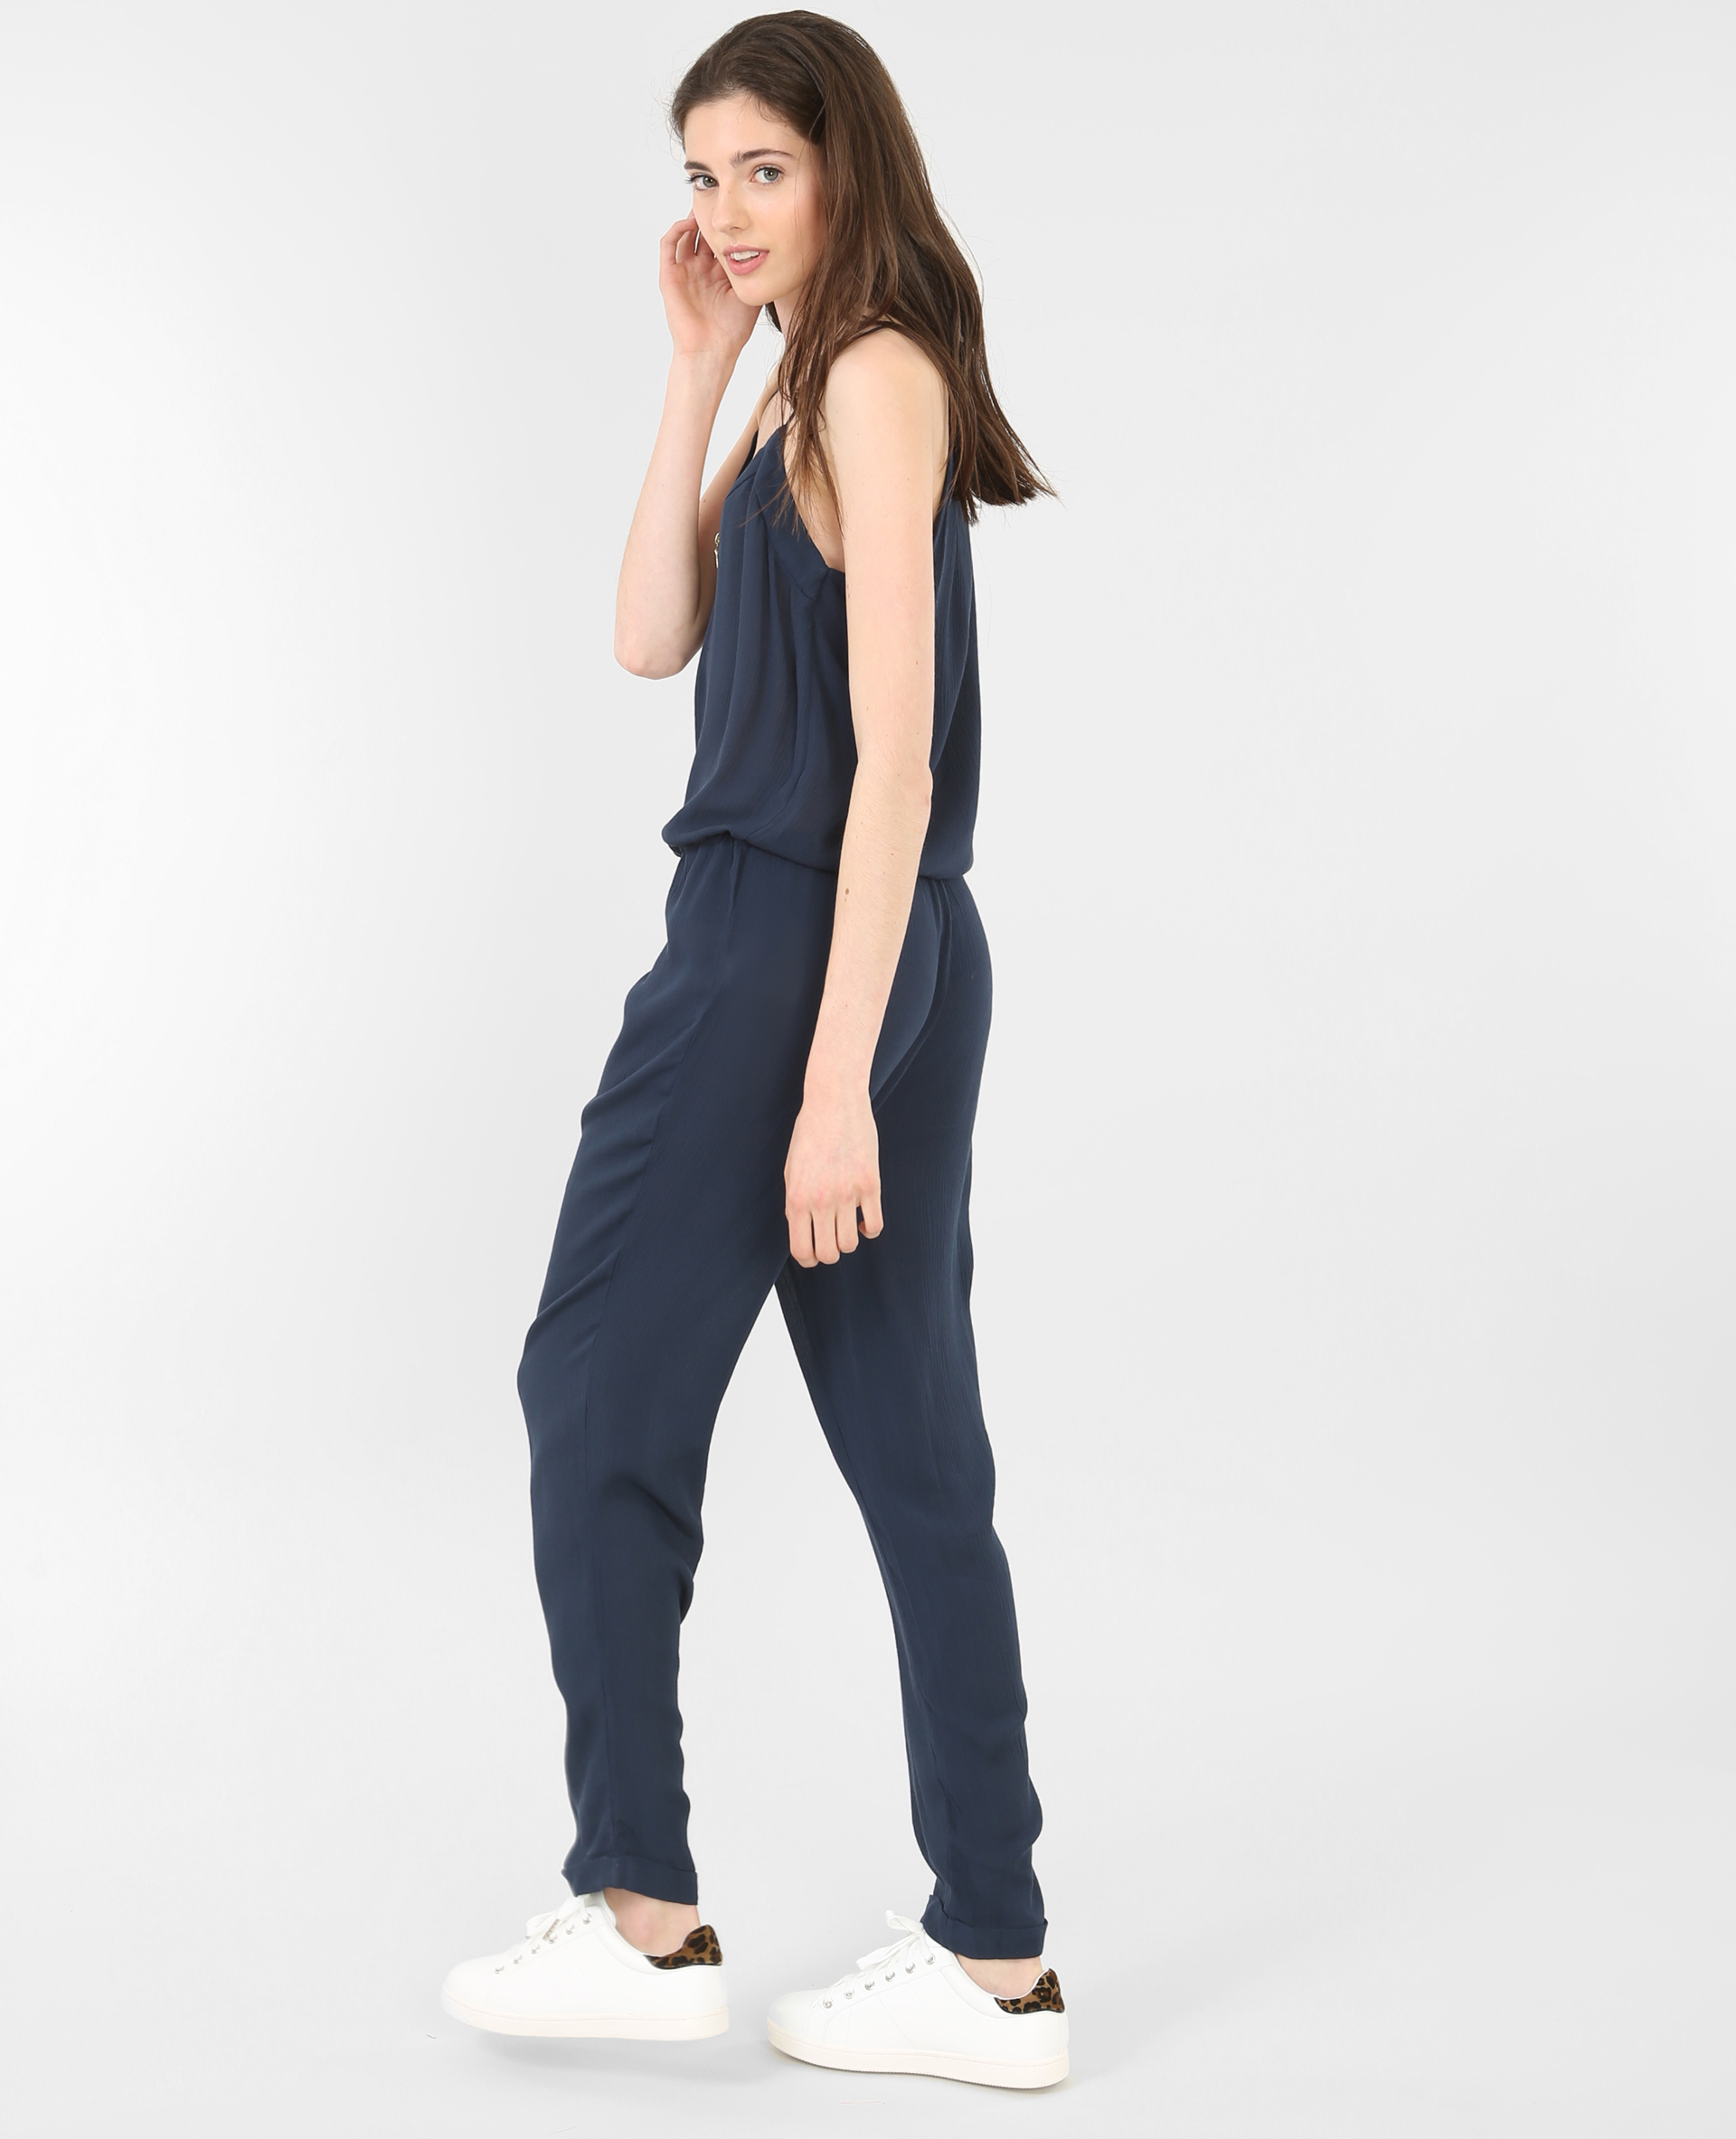 combi pantalon fluide bleu marine 151105635a06 pimkie. Black Bedroom Furniture Sets. Home Design Ideas